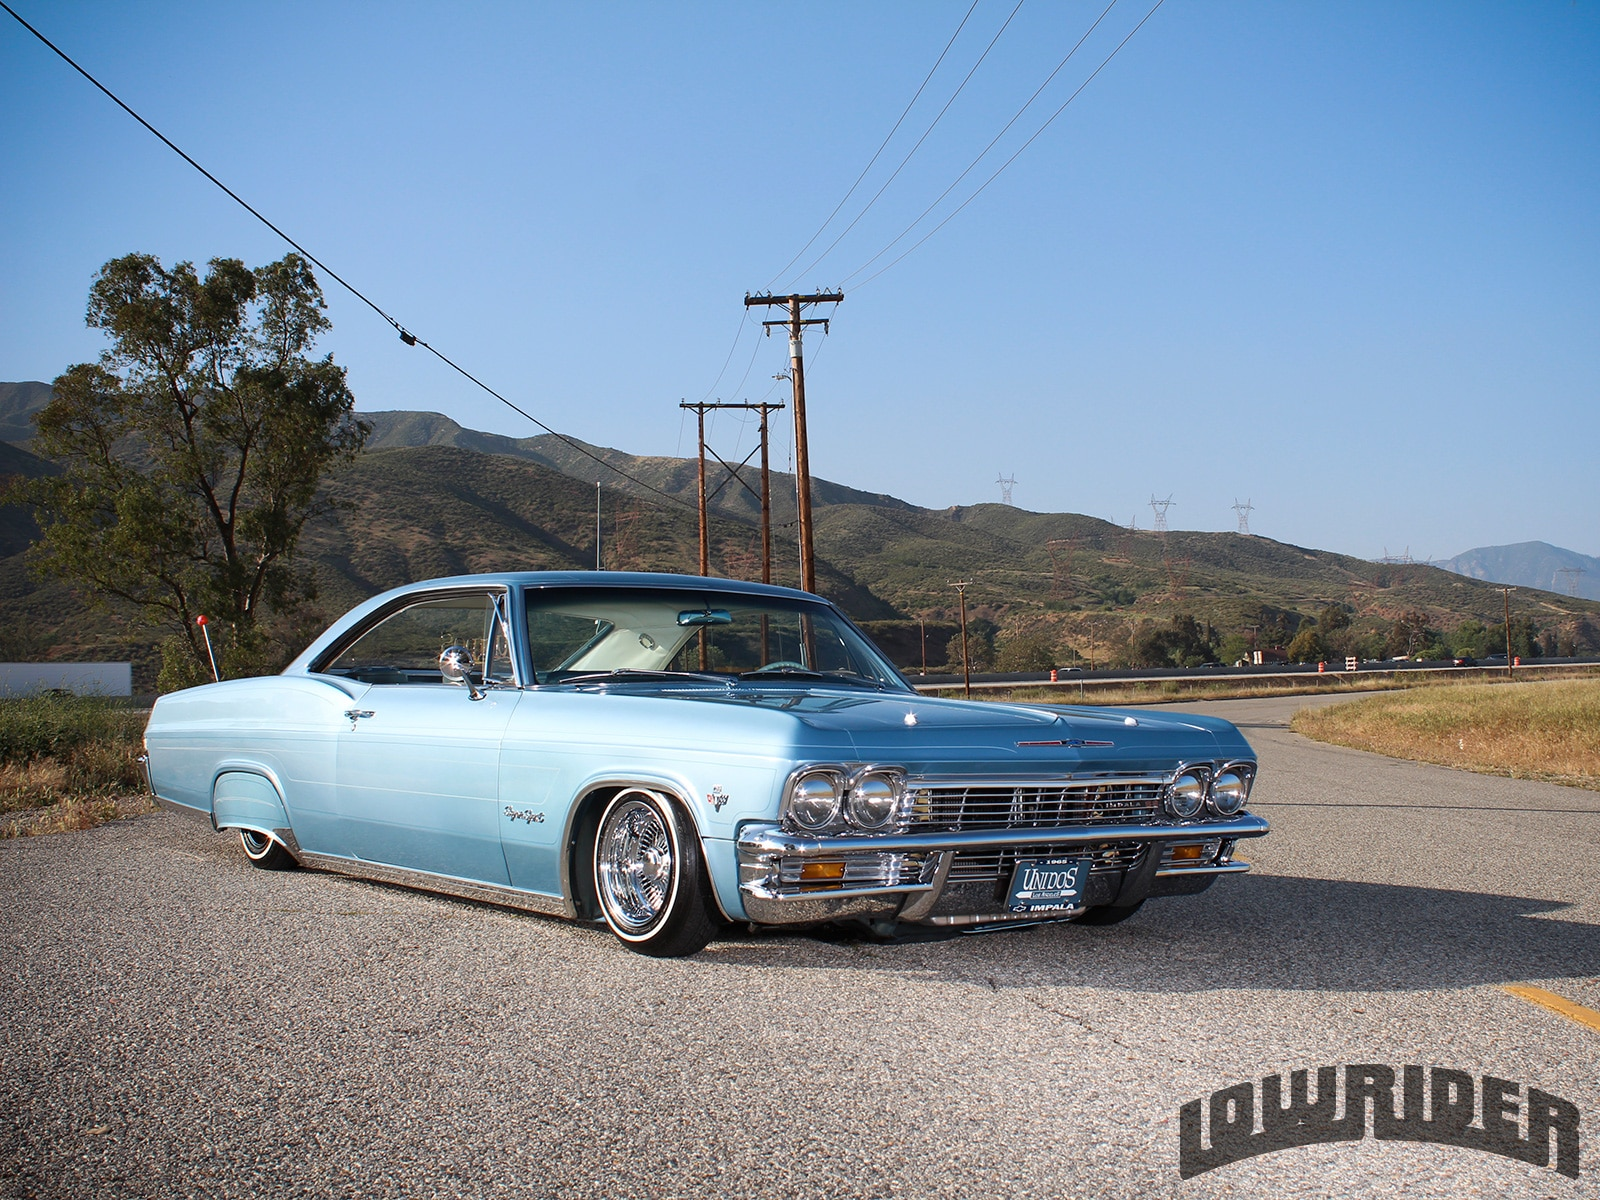 Lowrider Car Show 2018 >> 1965 Chevrolet Impala - Lowrider Magazine